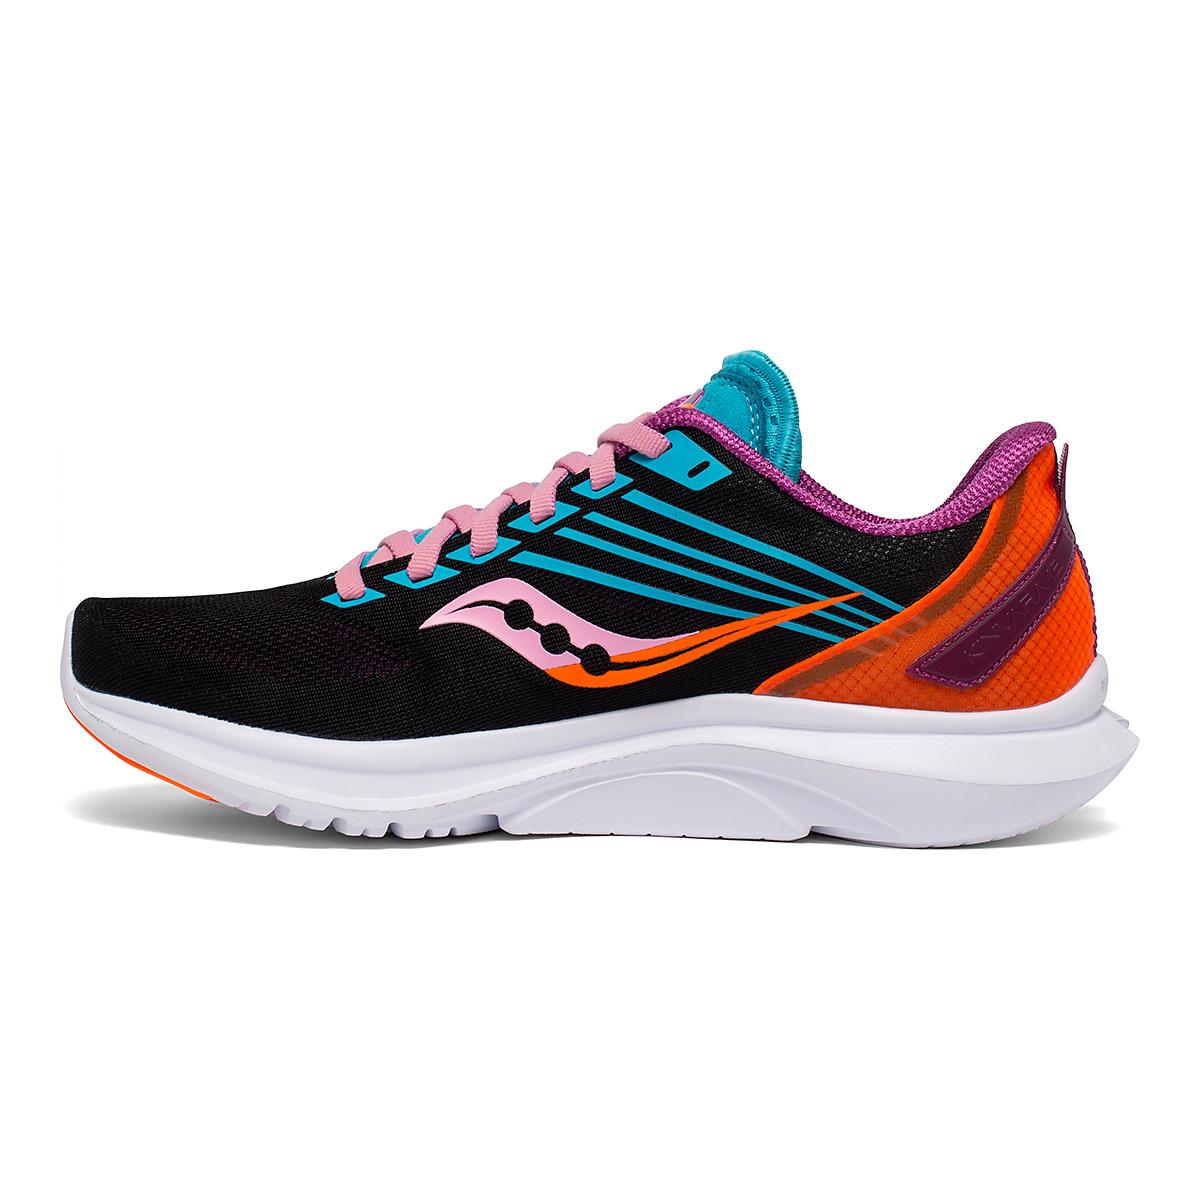 Women's Saucony Kinvara 12 Running Shoe - Color: Future/Black - Size: 5 - Width: Regular, Future/Black, large, image 3